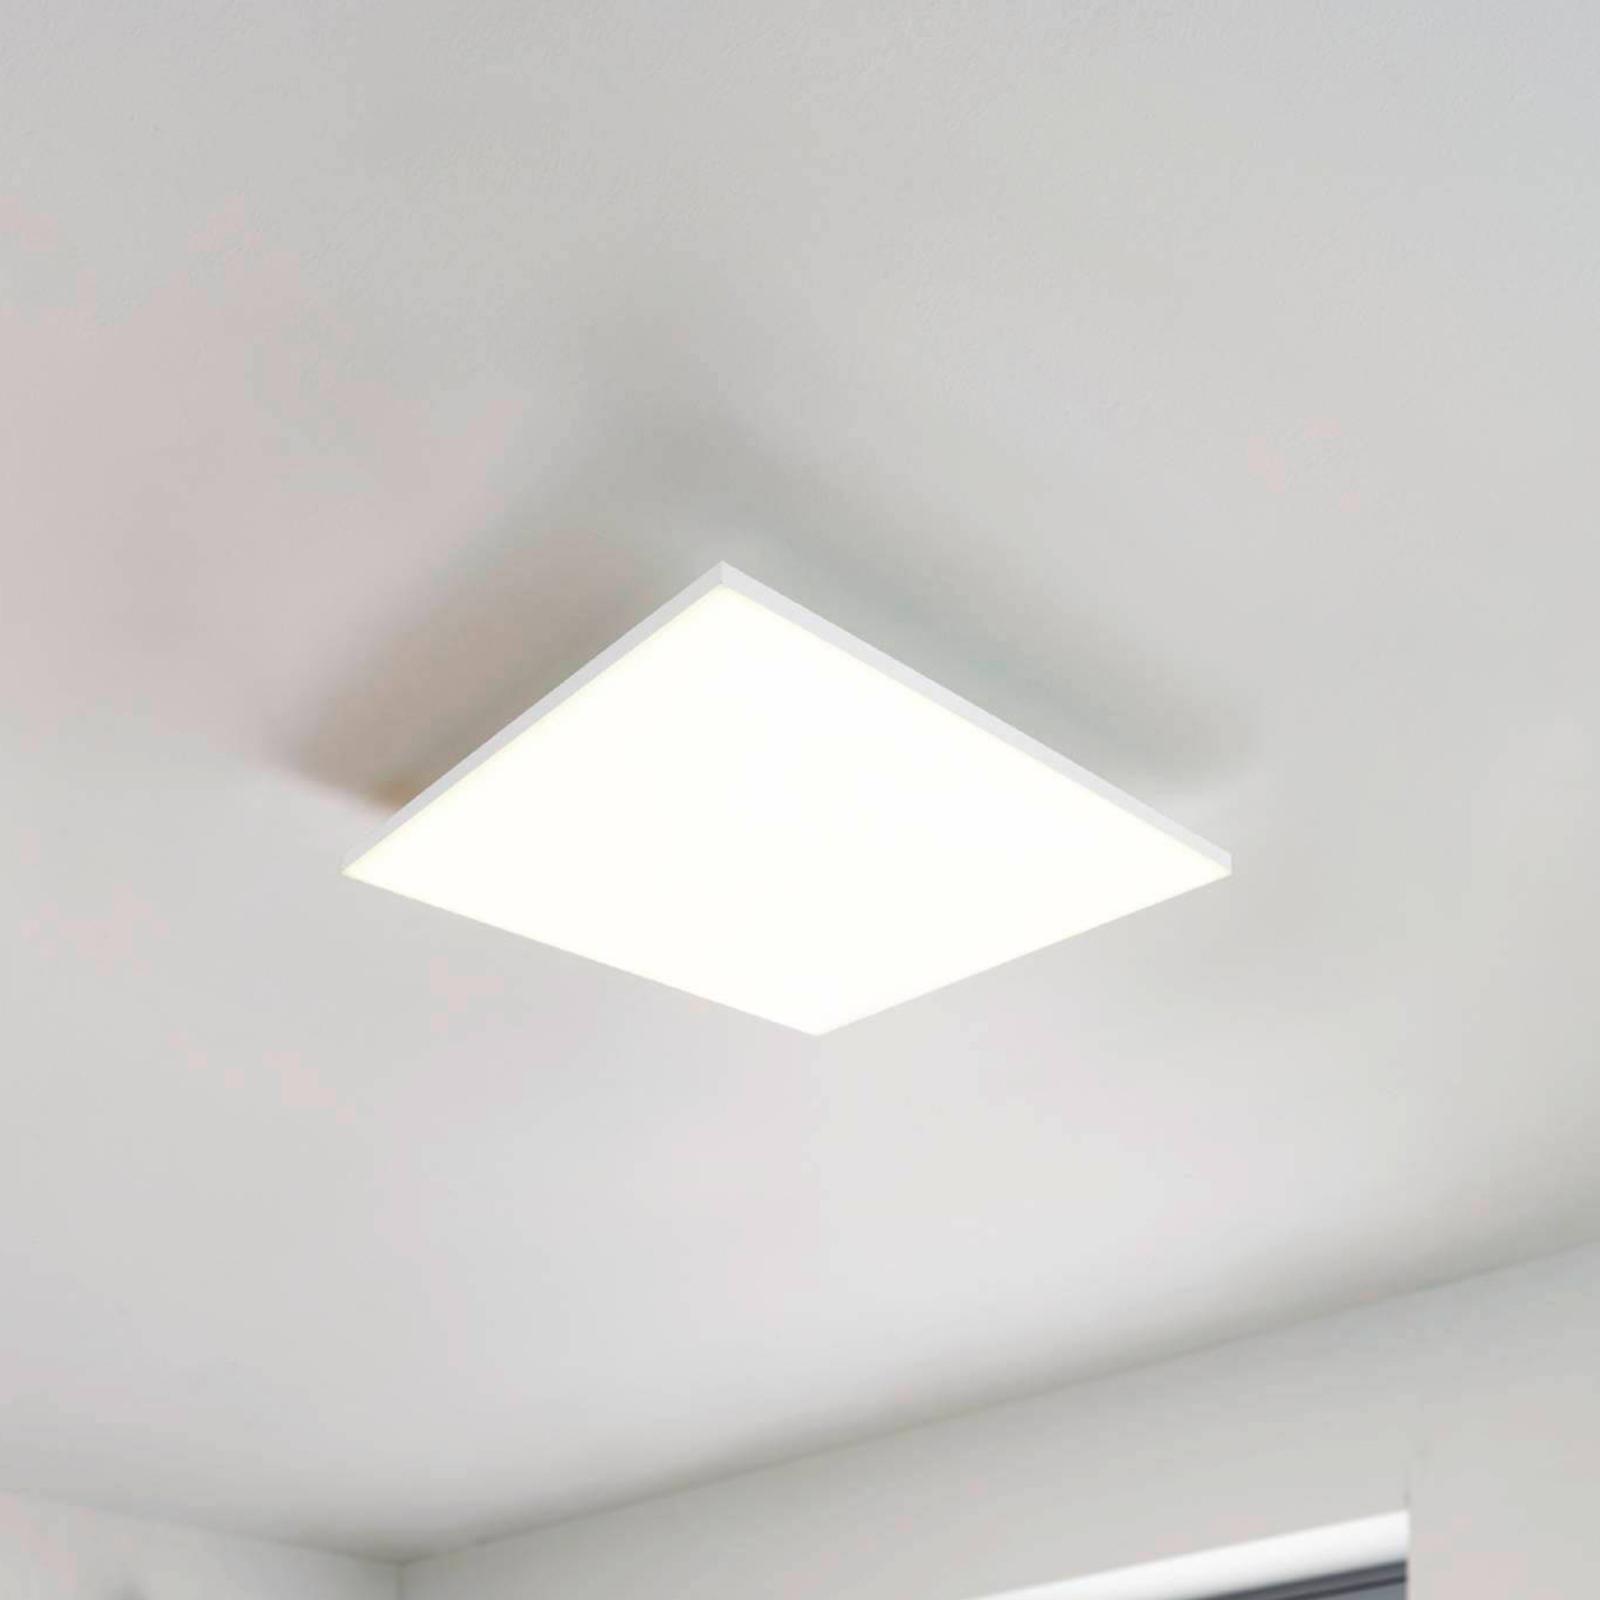 EGLO connect Turcona-C -LED-kattovalaisin 30x30 cm